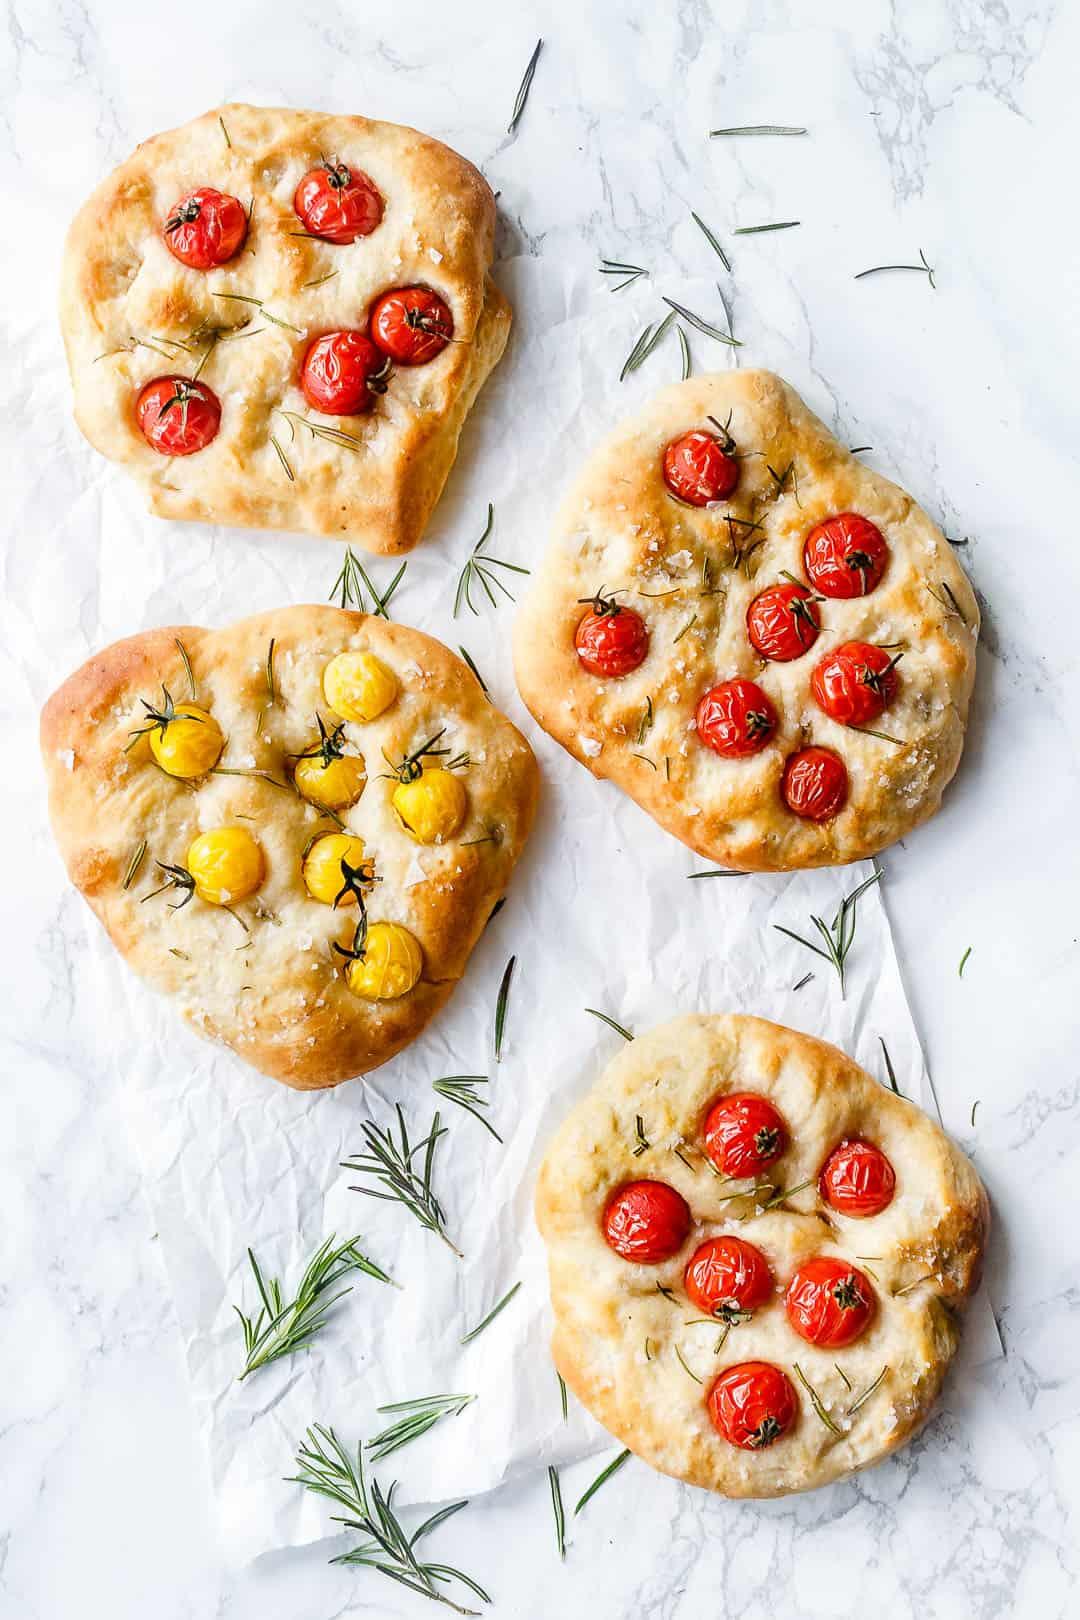 Foccacia brød med tomat og rosmarin - opskrift på italiensk madbrød